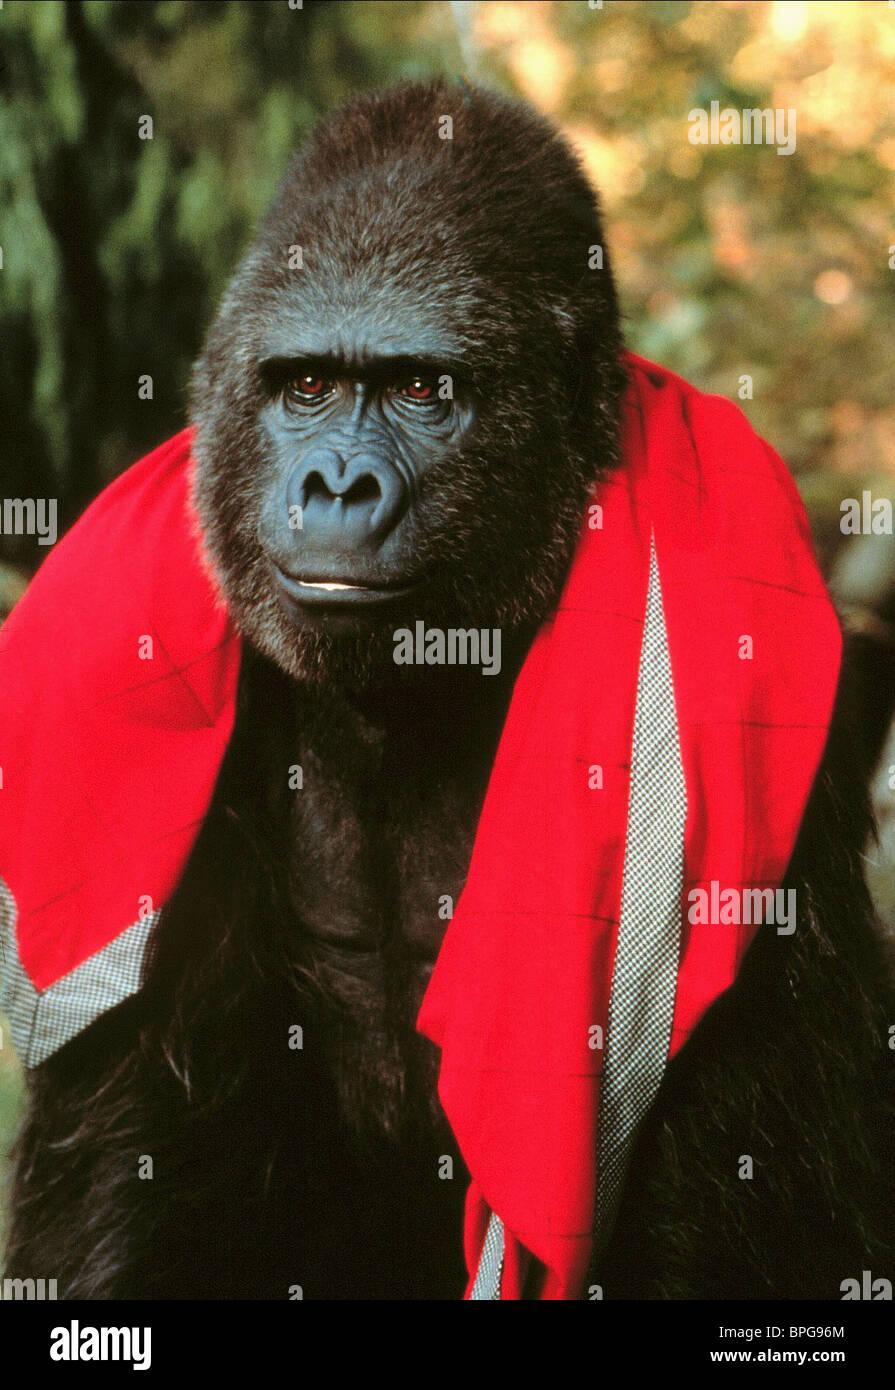 Gorila Buddy (1997) Imagen De Stock